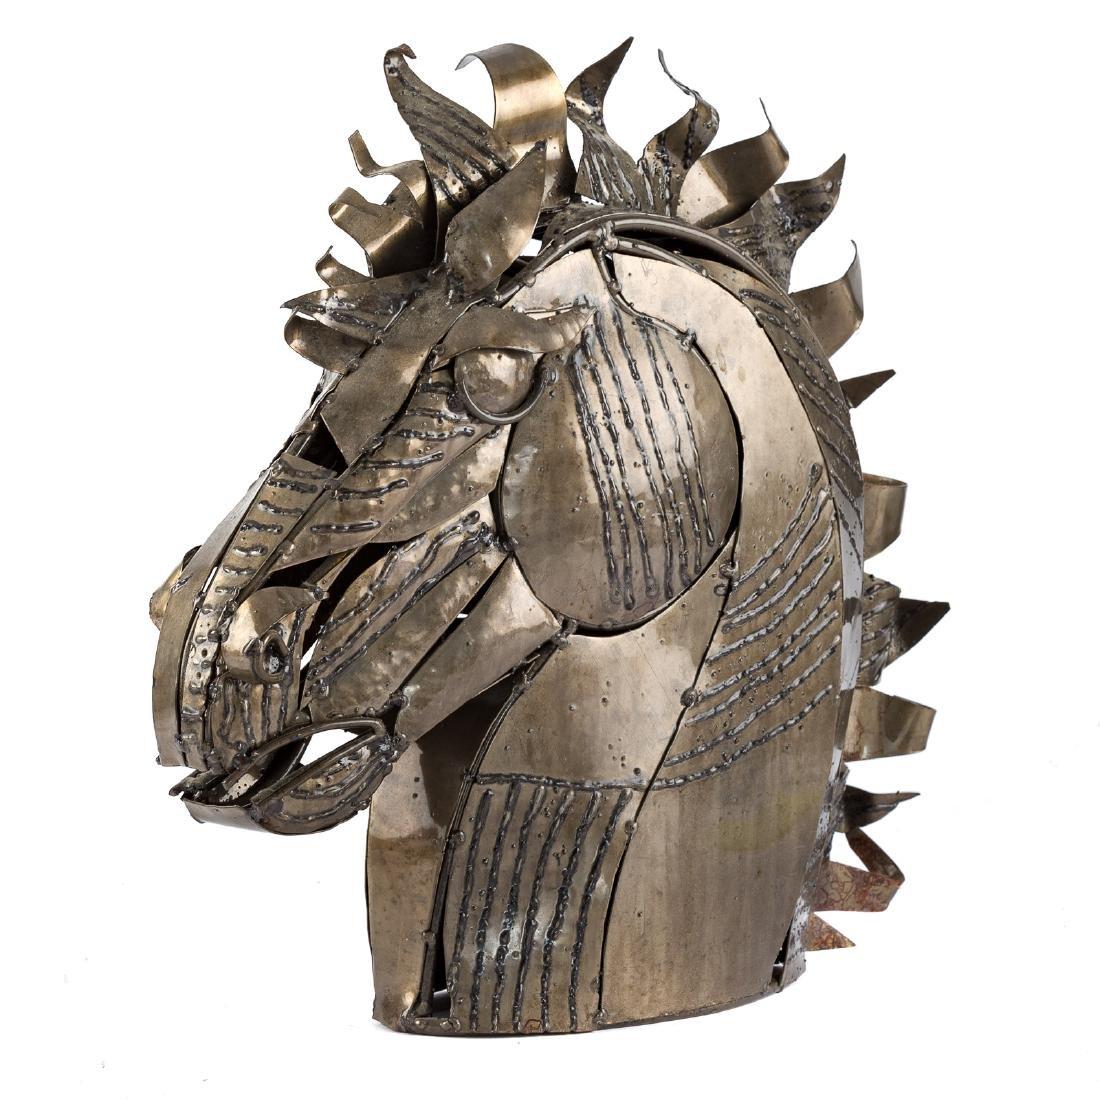 Contemporary School. Bust of Horse, sculpture - 3